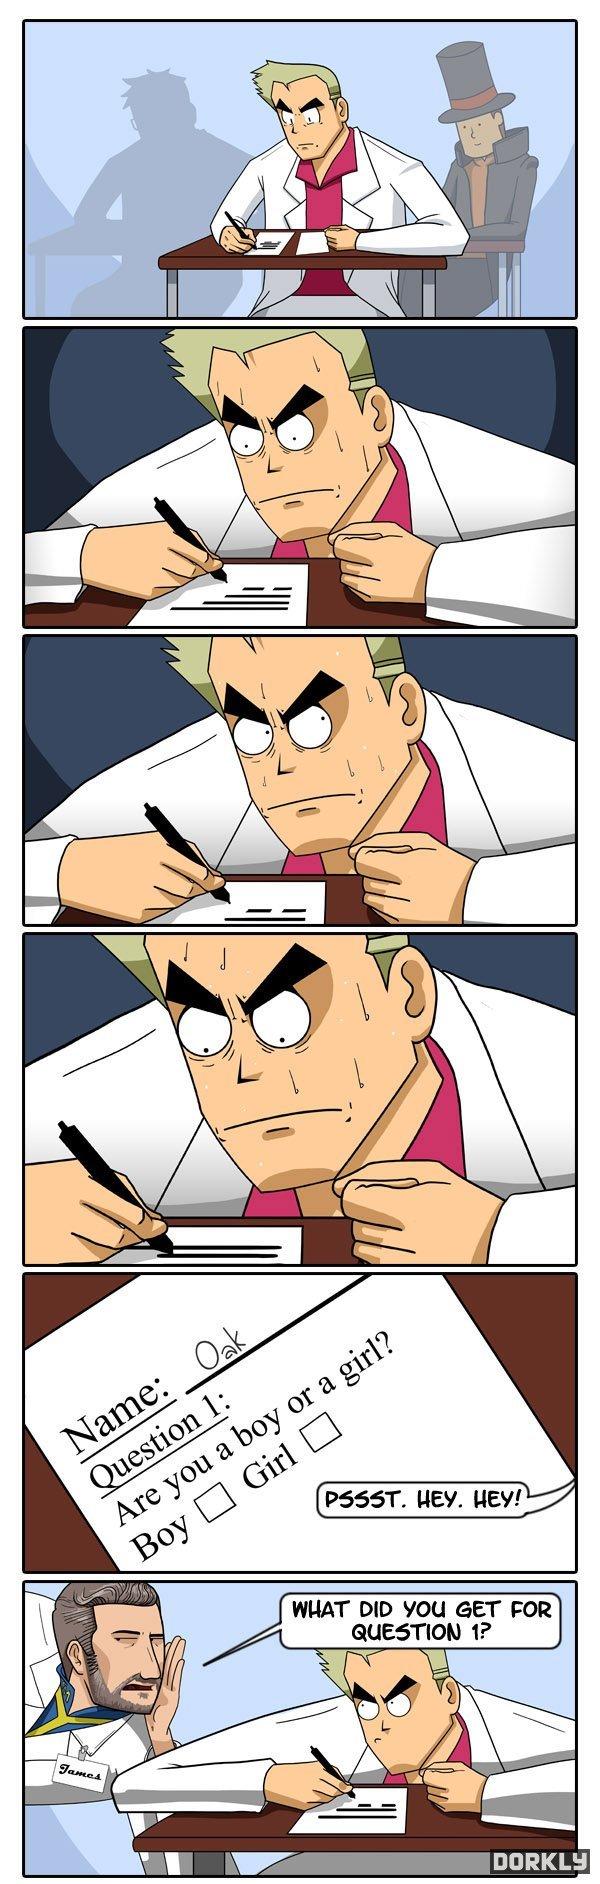 Professor Oak's Test. deedz to dorkly, don't check tags.